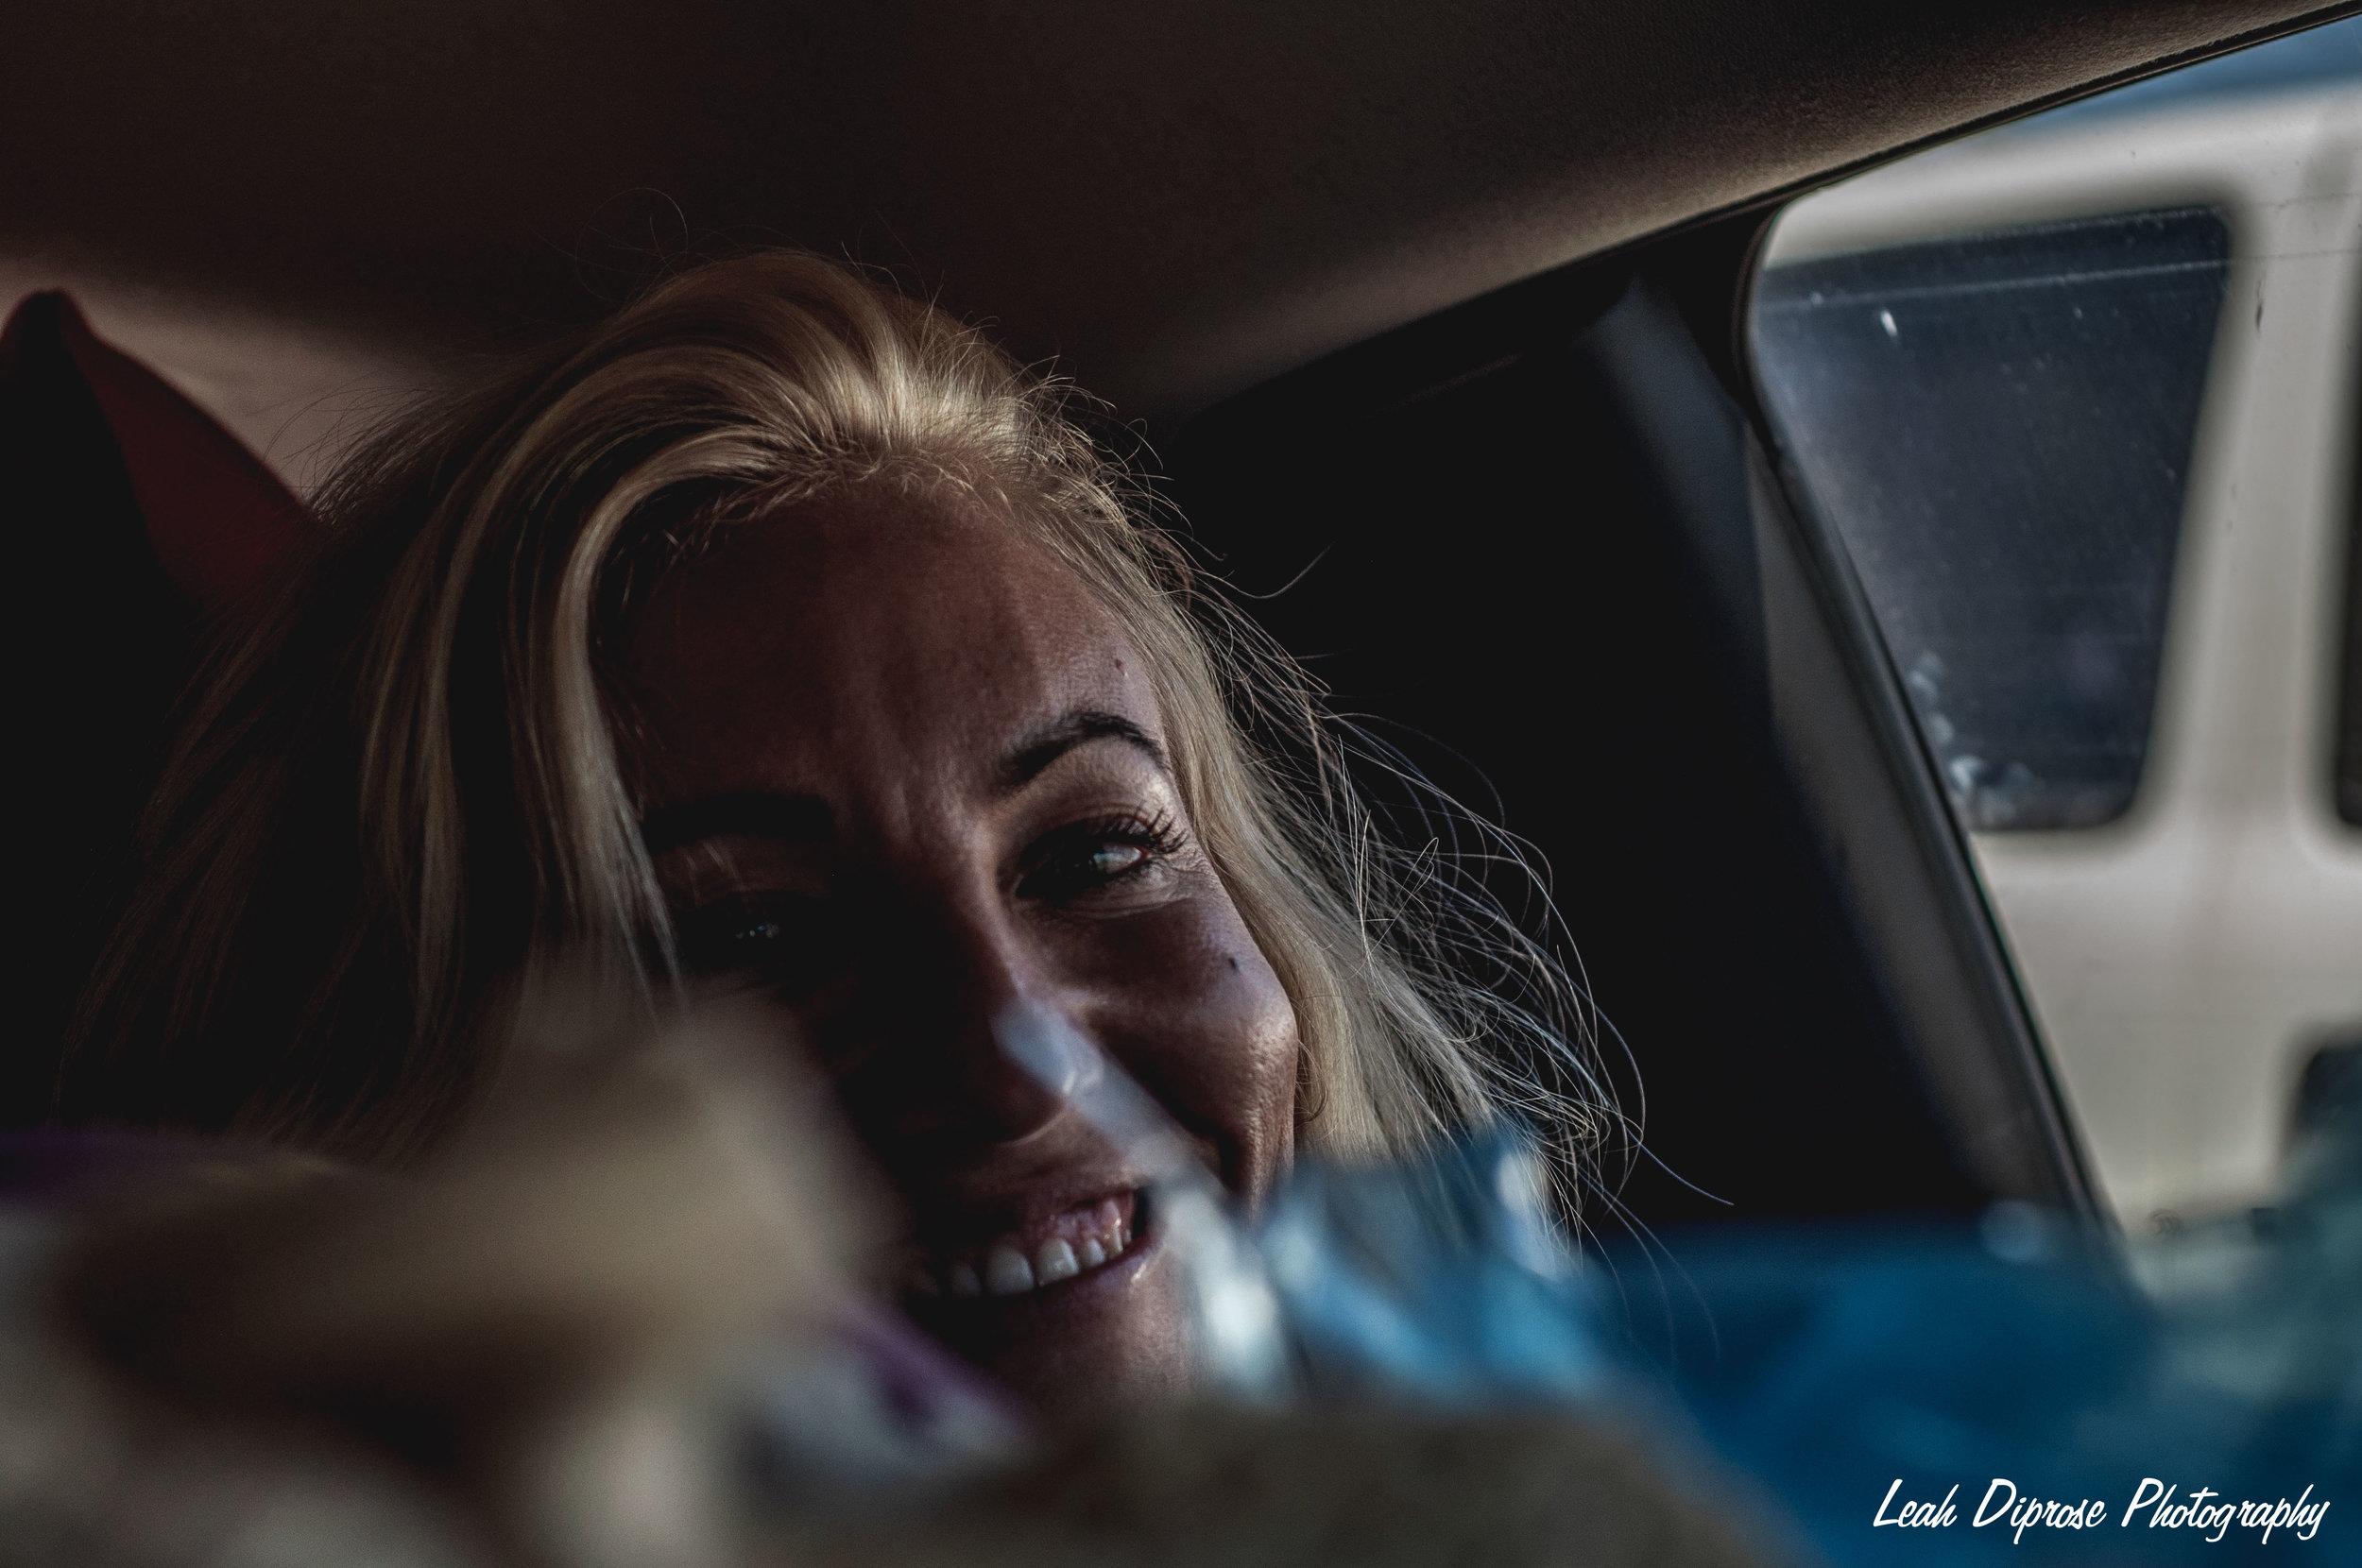 Leah Diprose Photography image-6258.jpg